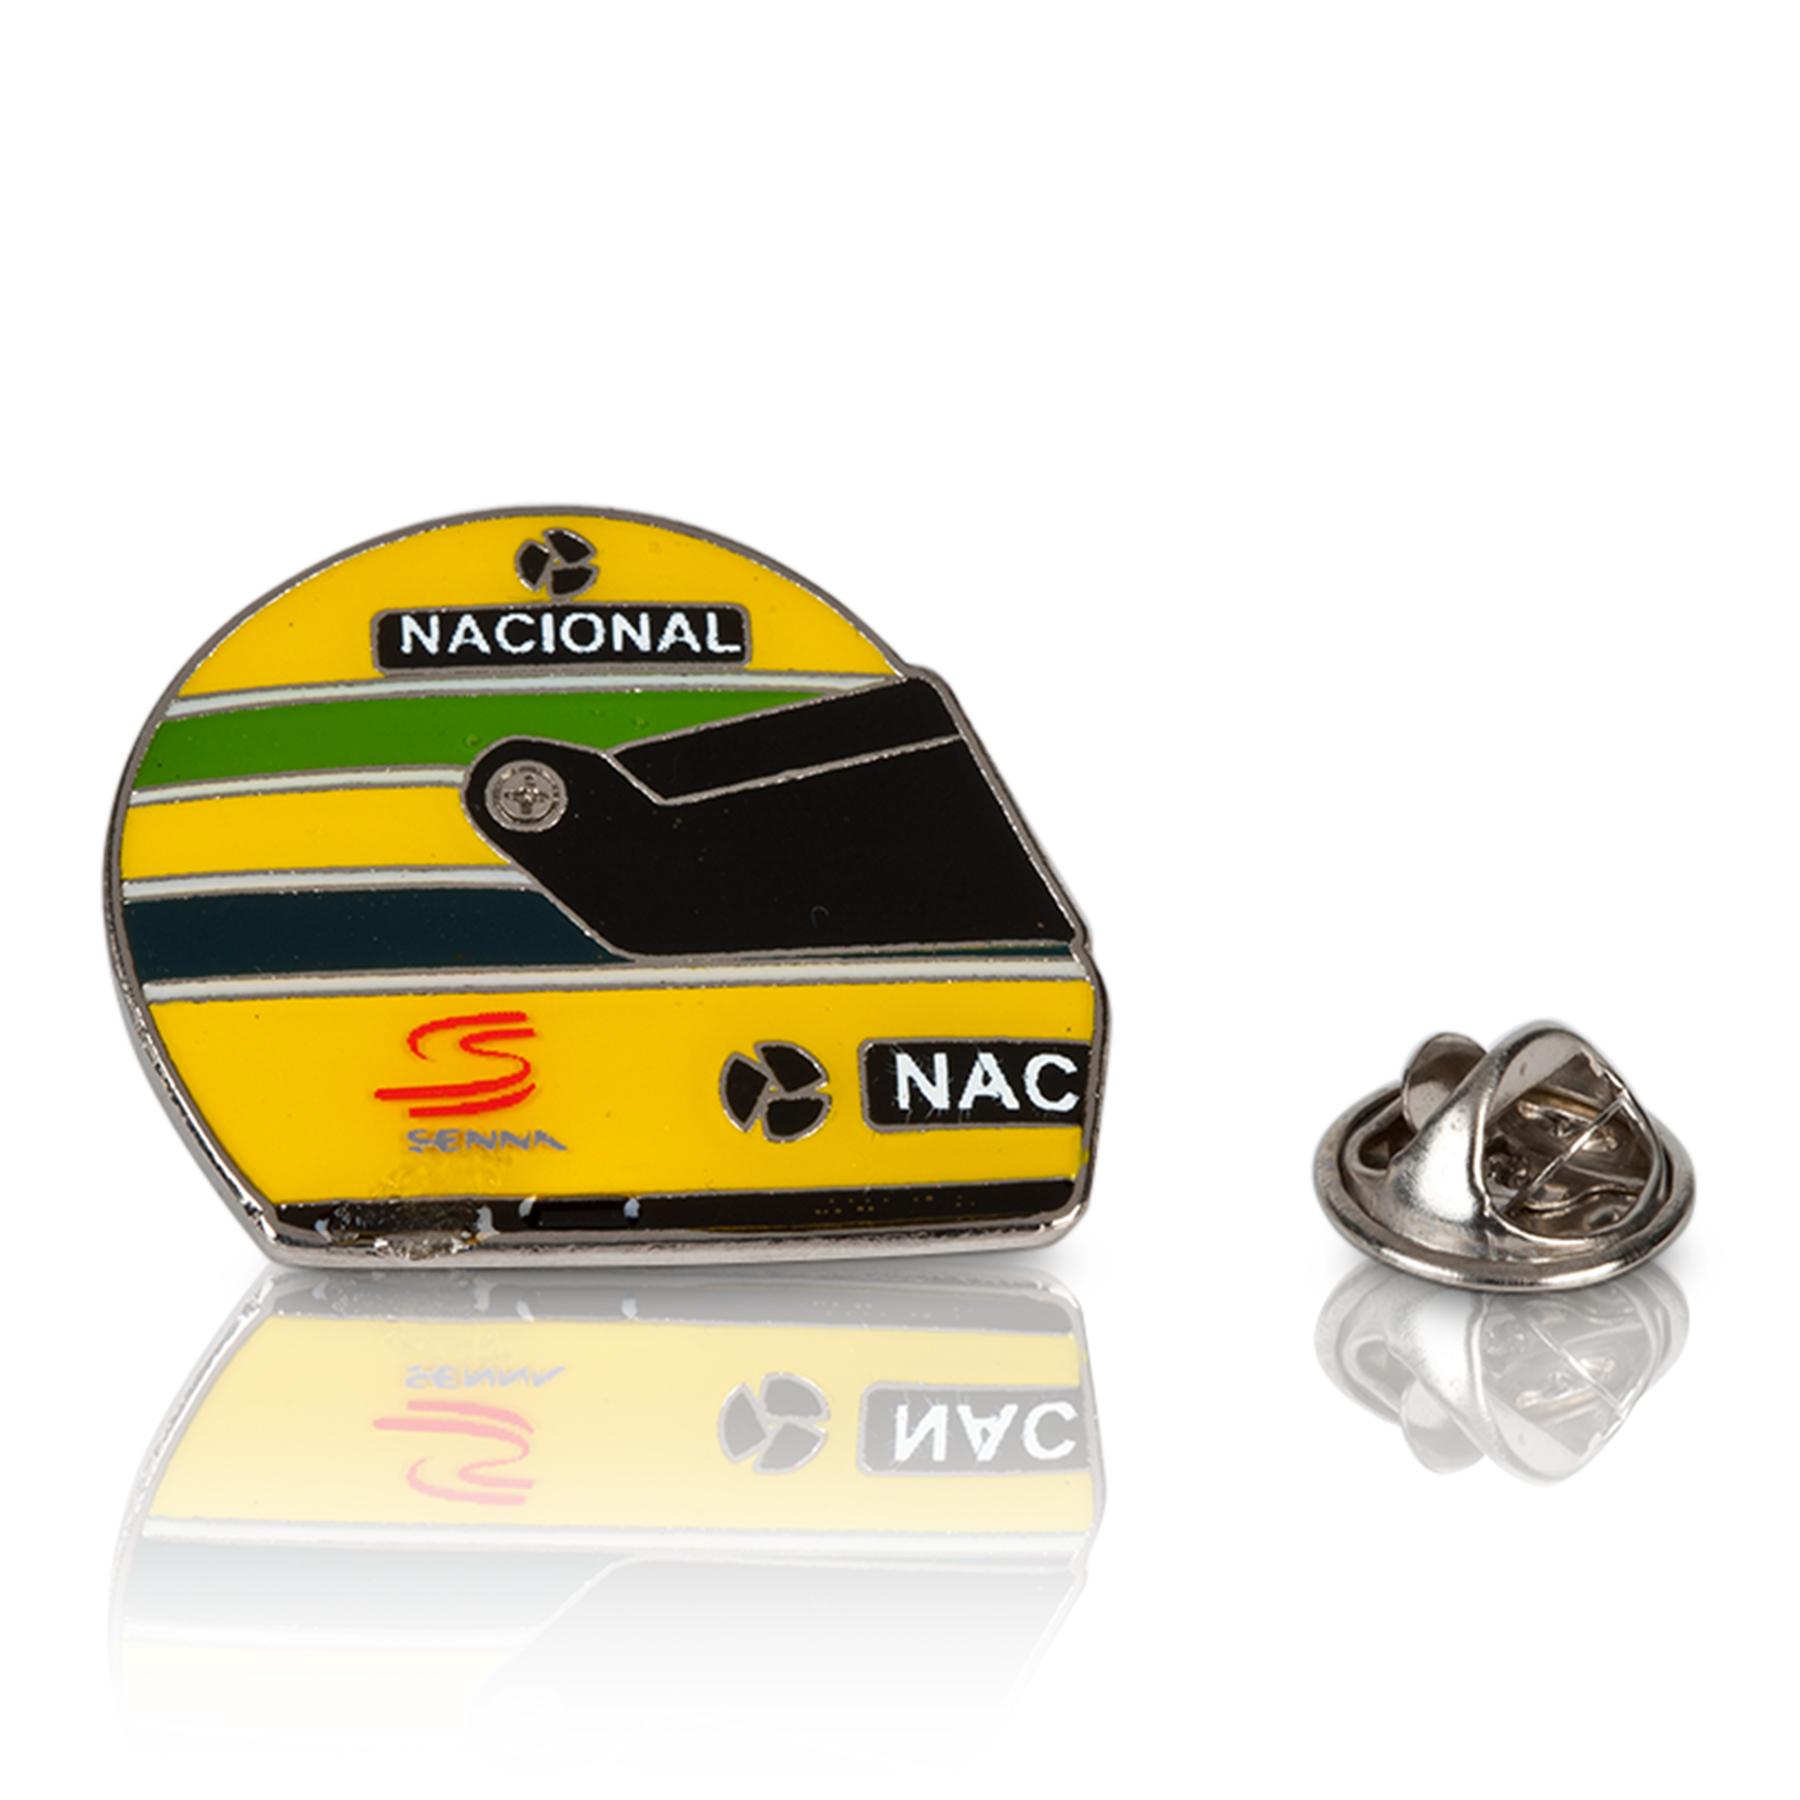 Image of Ayrton Senna 1990 Helmet Pin Badge